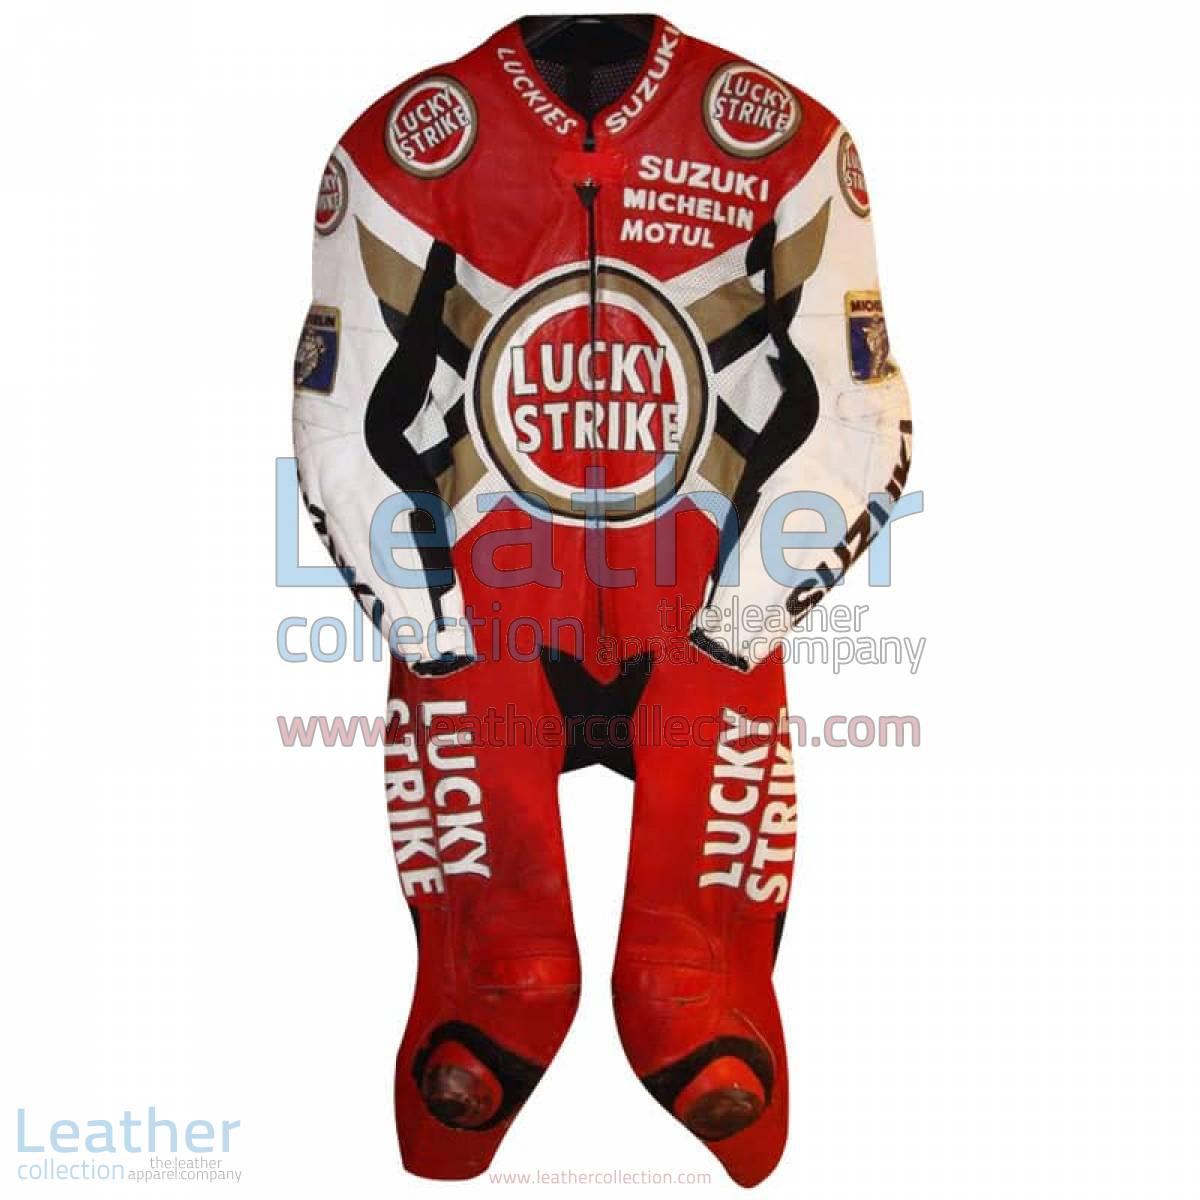 Anthony Gobert Suzuki Lucky Strike 1997 MotoGP Leathers | motogp leathers